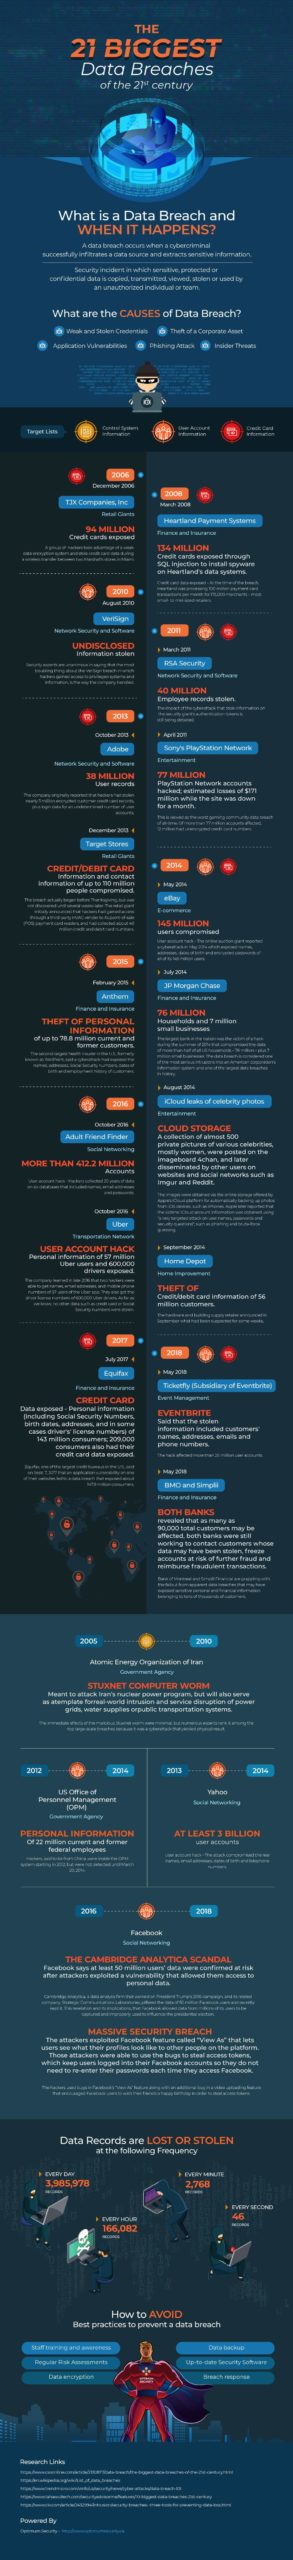 21-Biggest-Data-Breaches-of-the-21st-Century